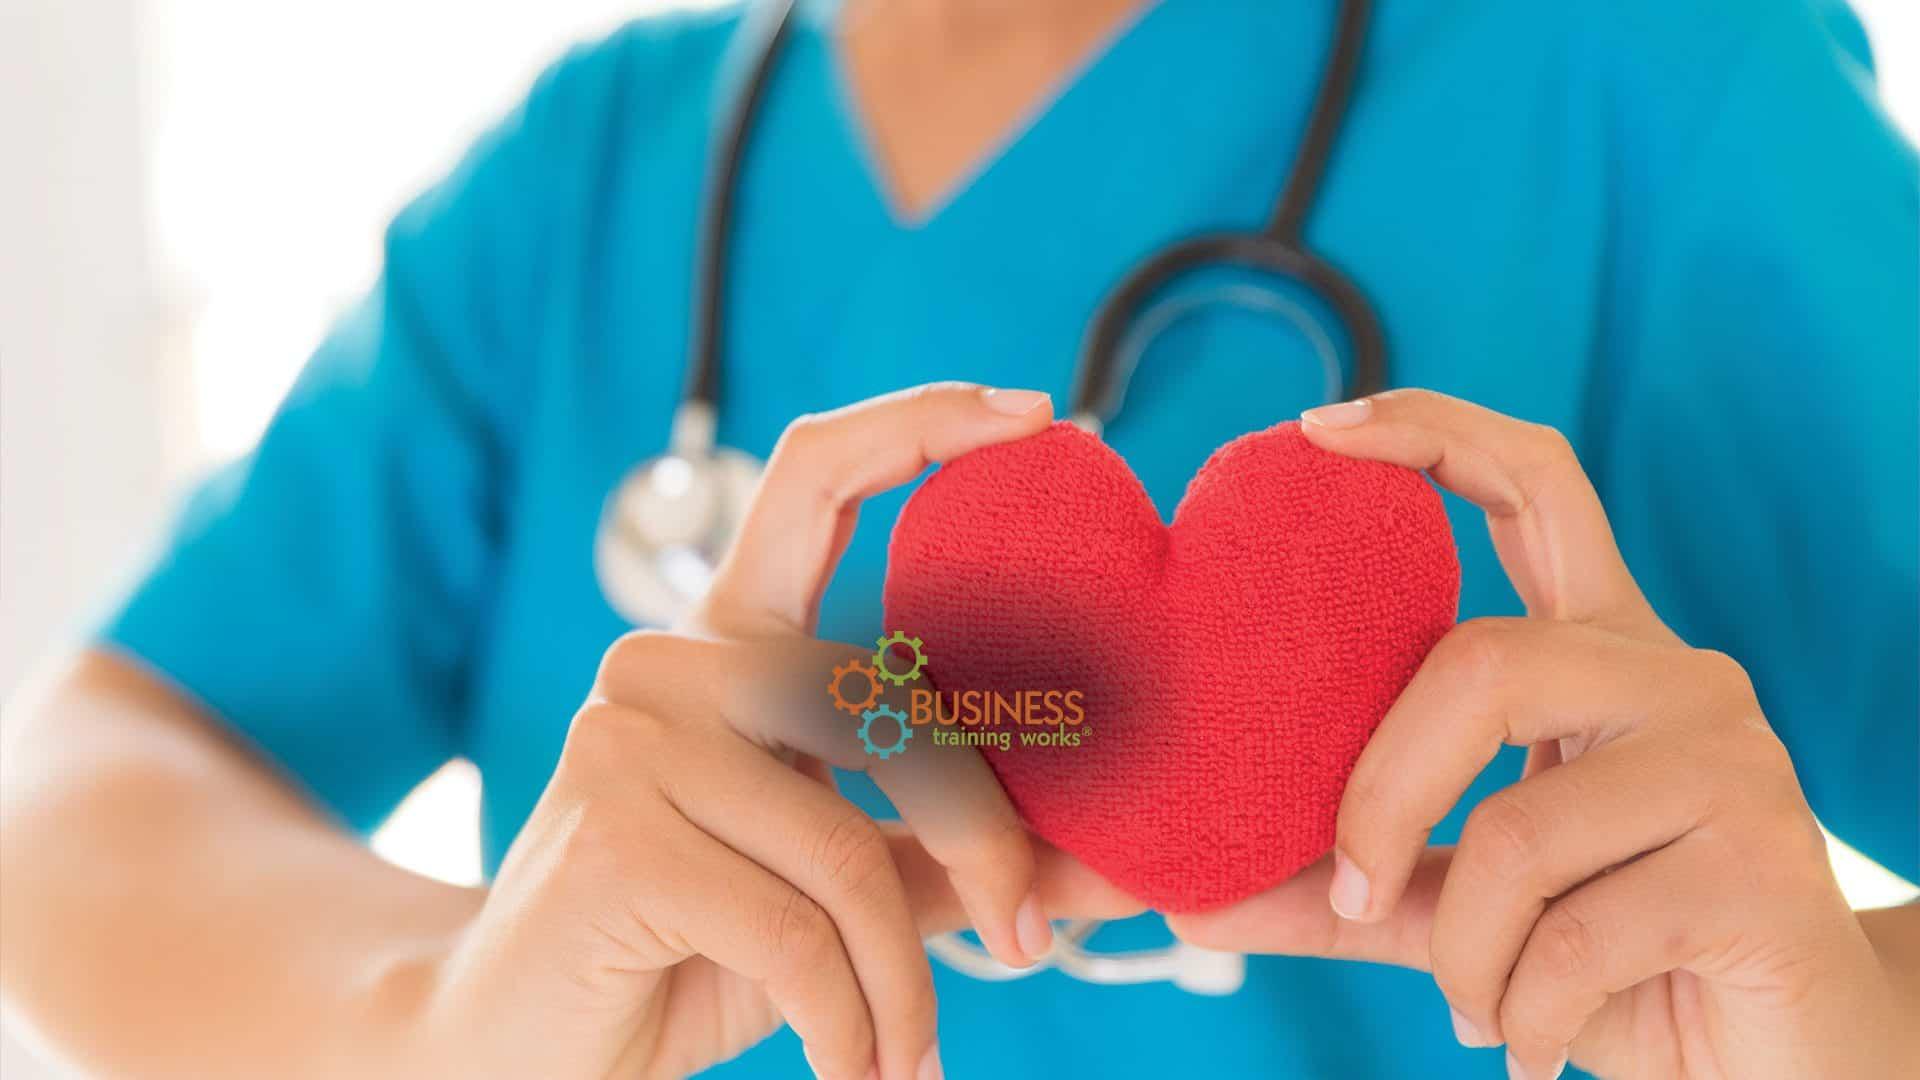 Web-Based Emotional Intelligence Course for Healthcare